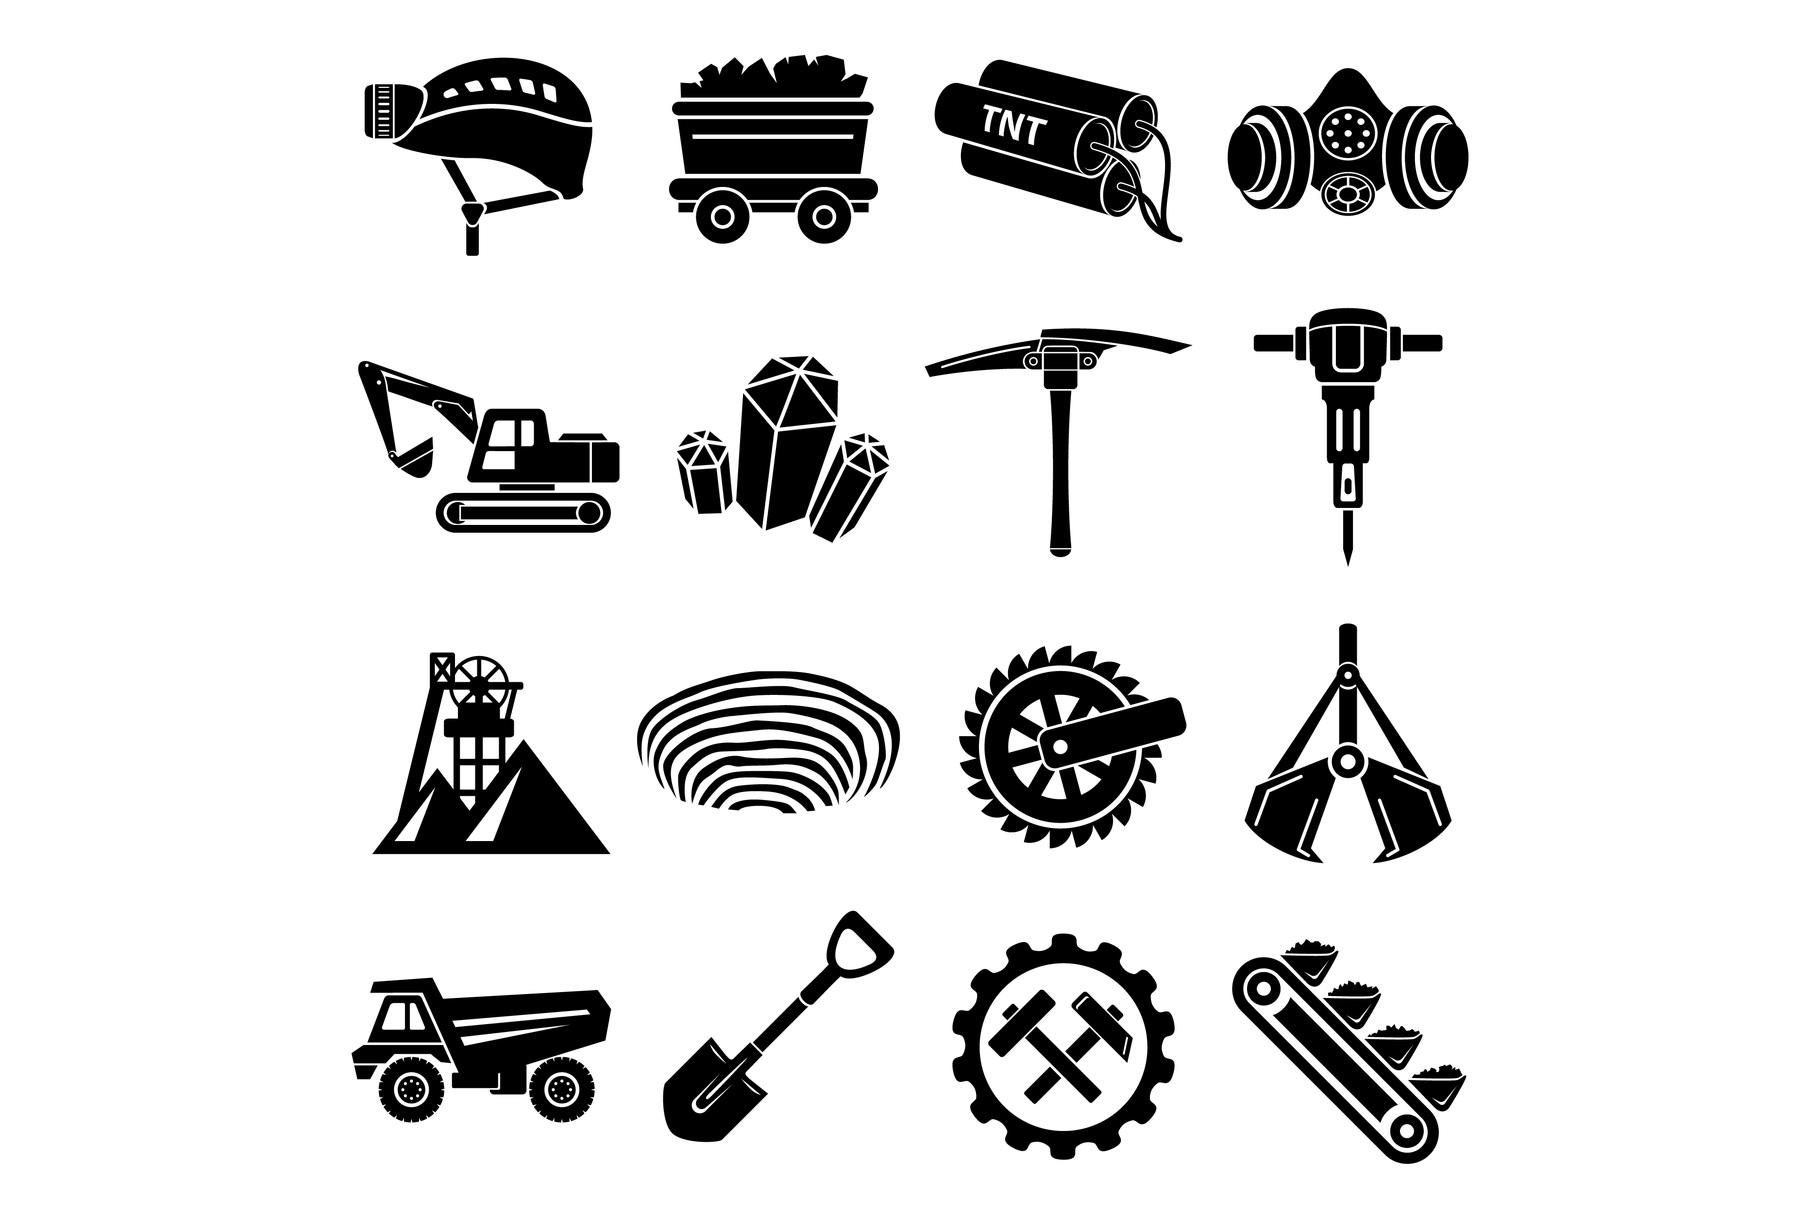 Coal mine icons set, simple style example image 1